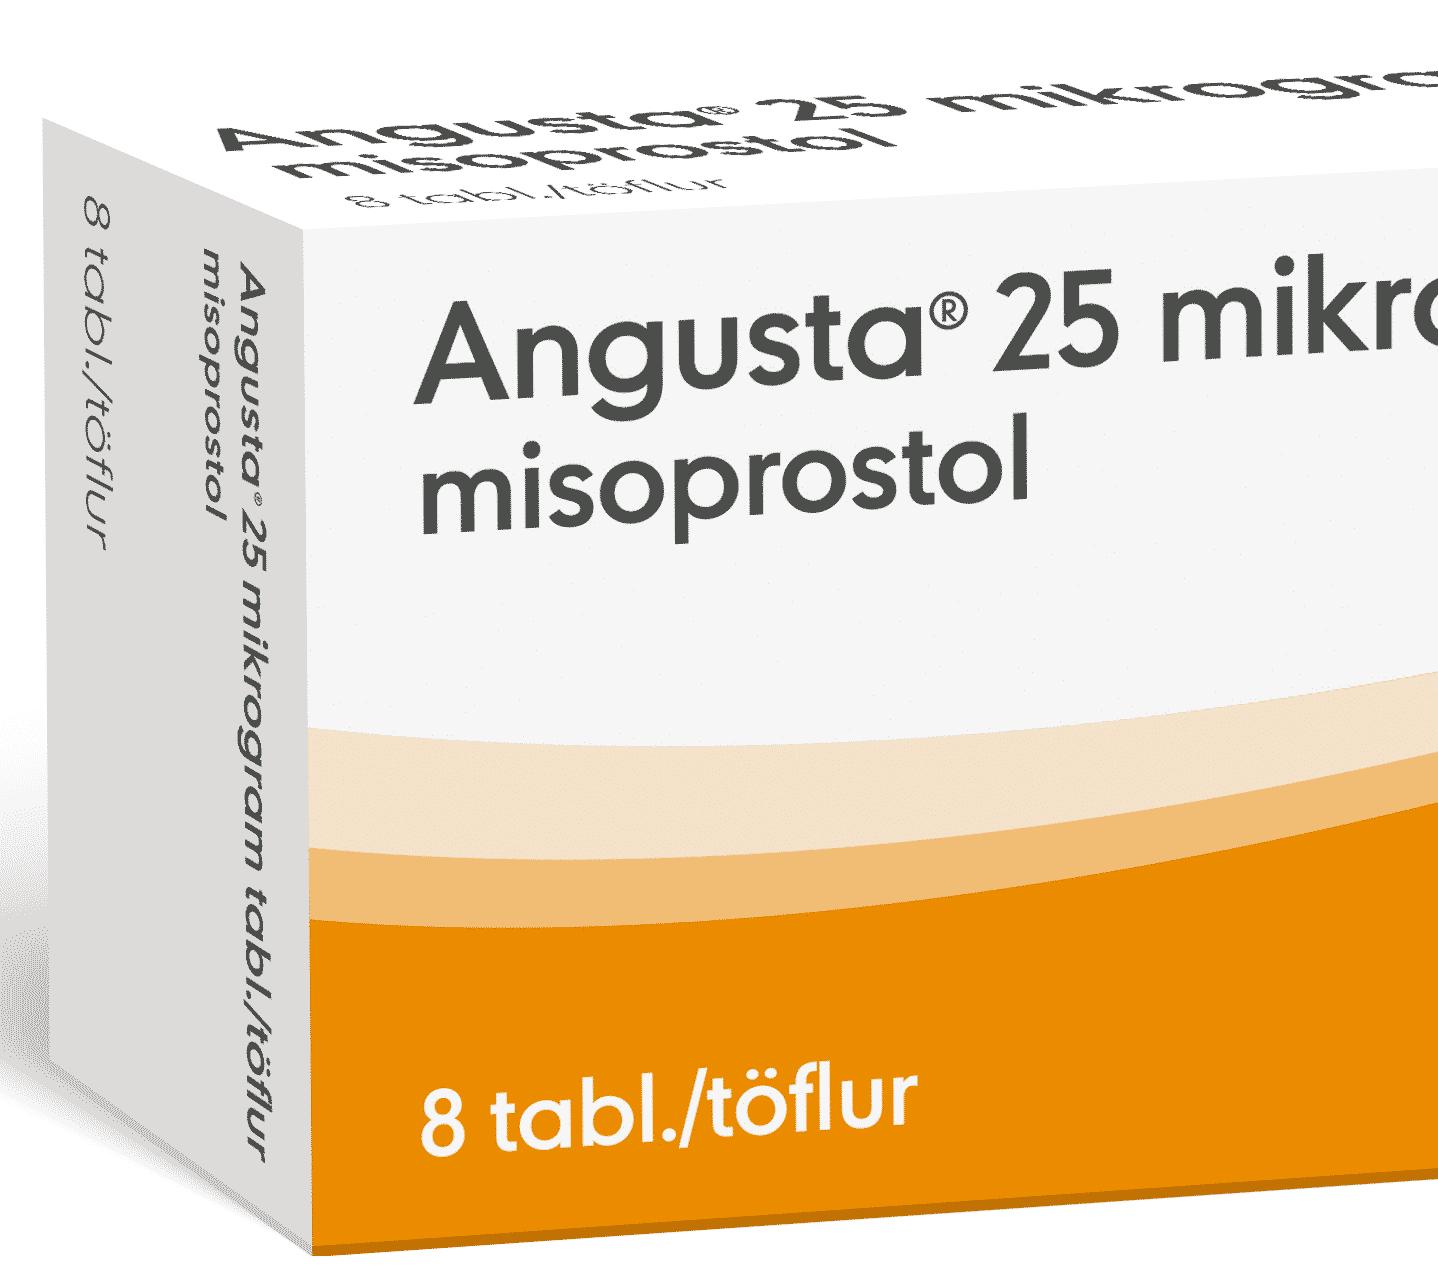 Angusta